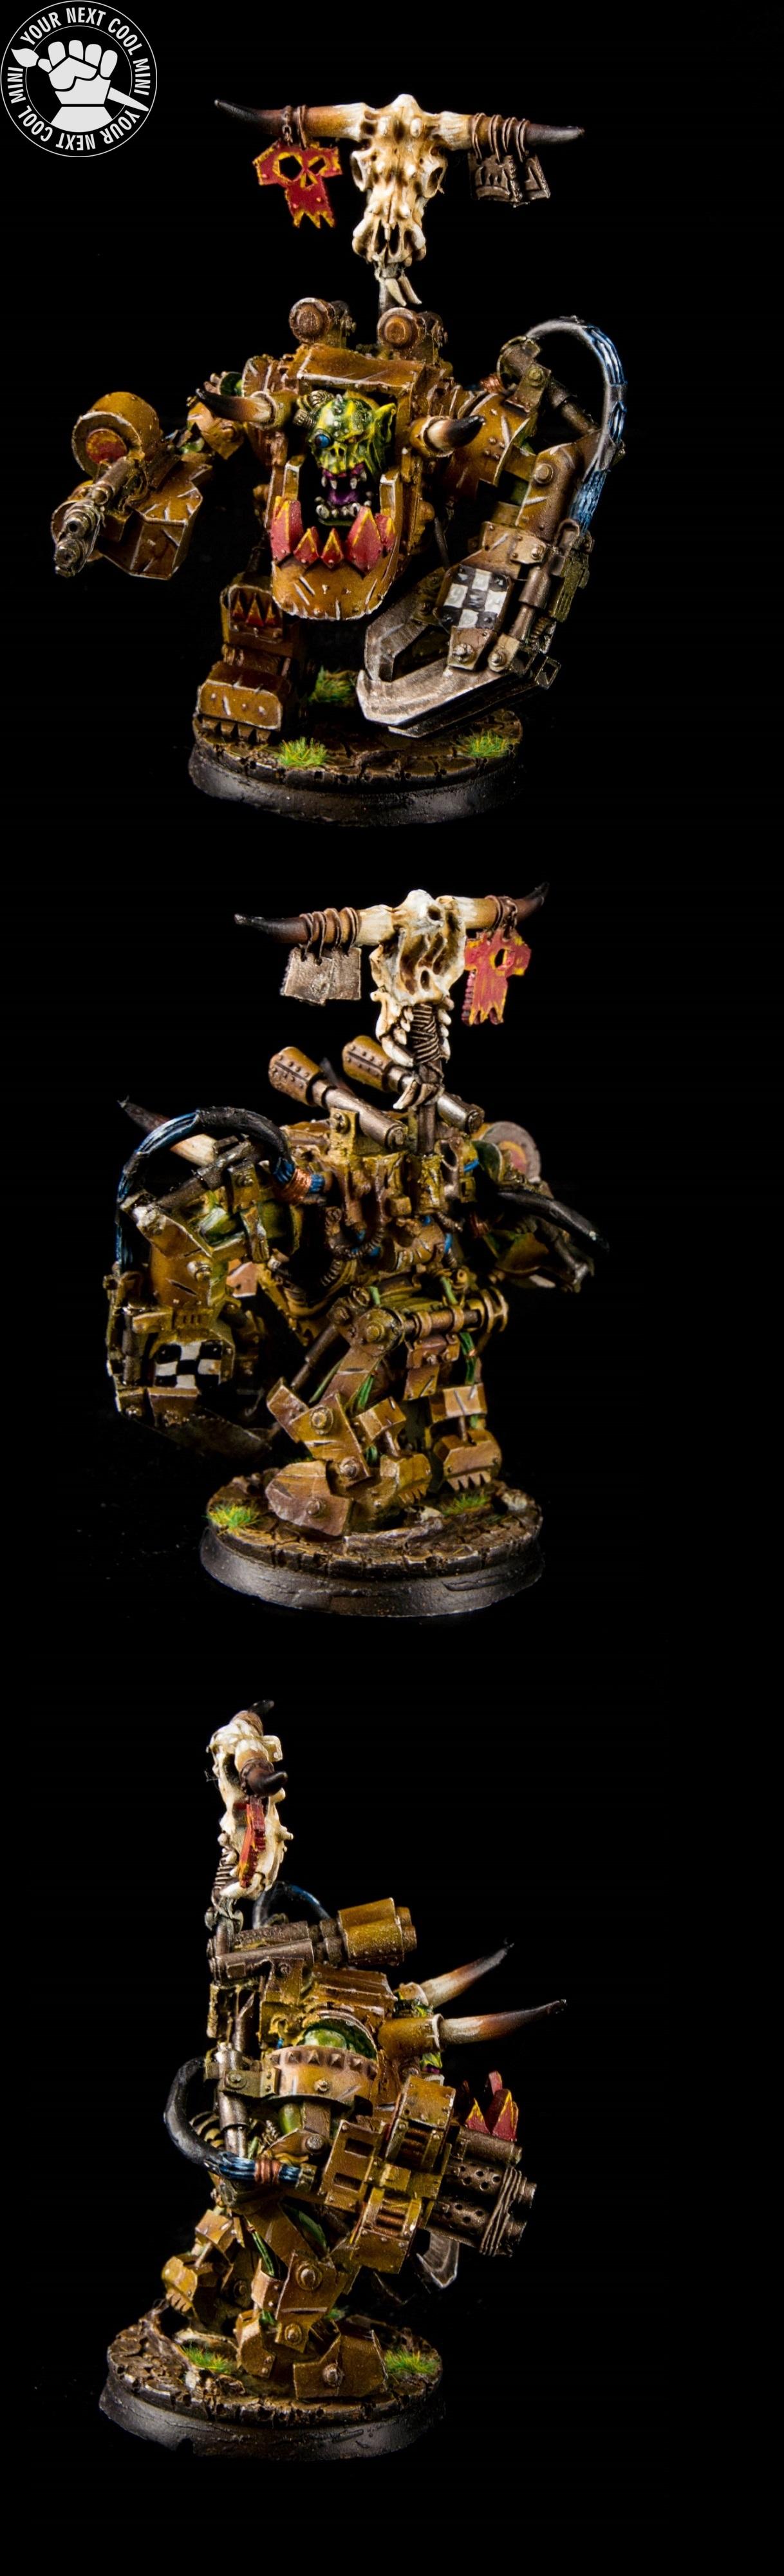 Warhammer 40K Space Orks, Ghazghkull Thraka, Yellow